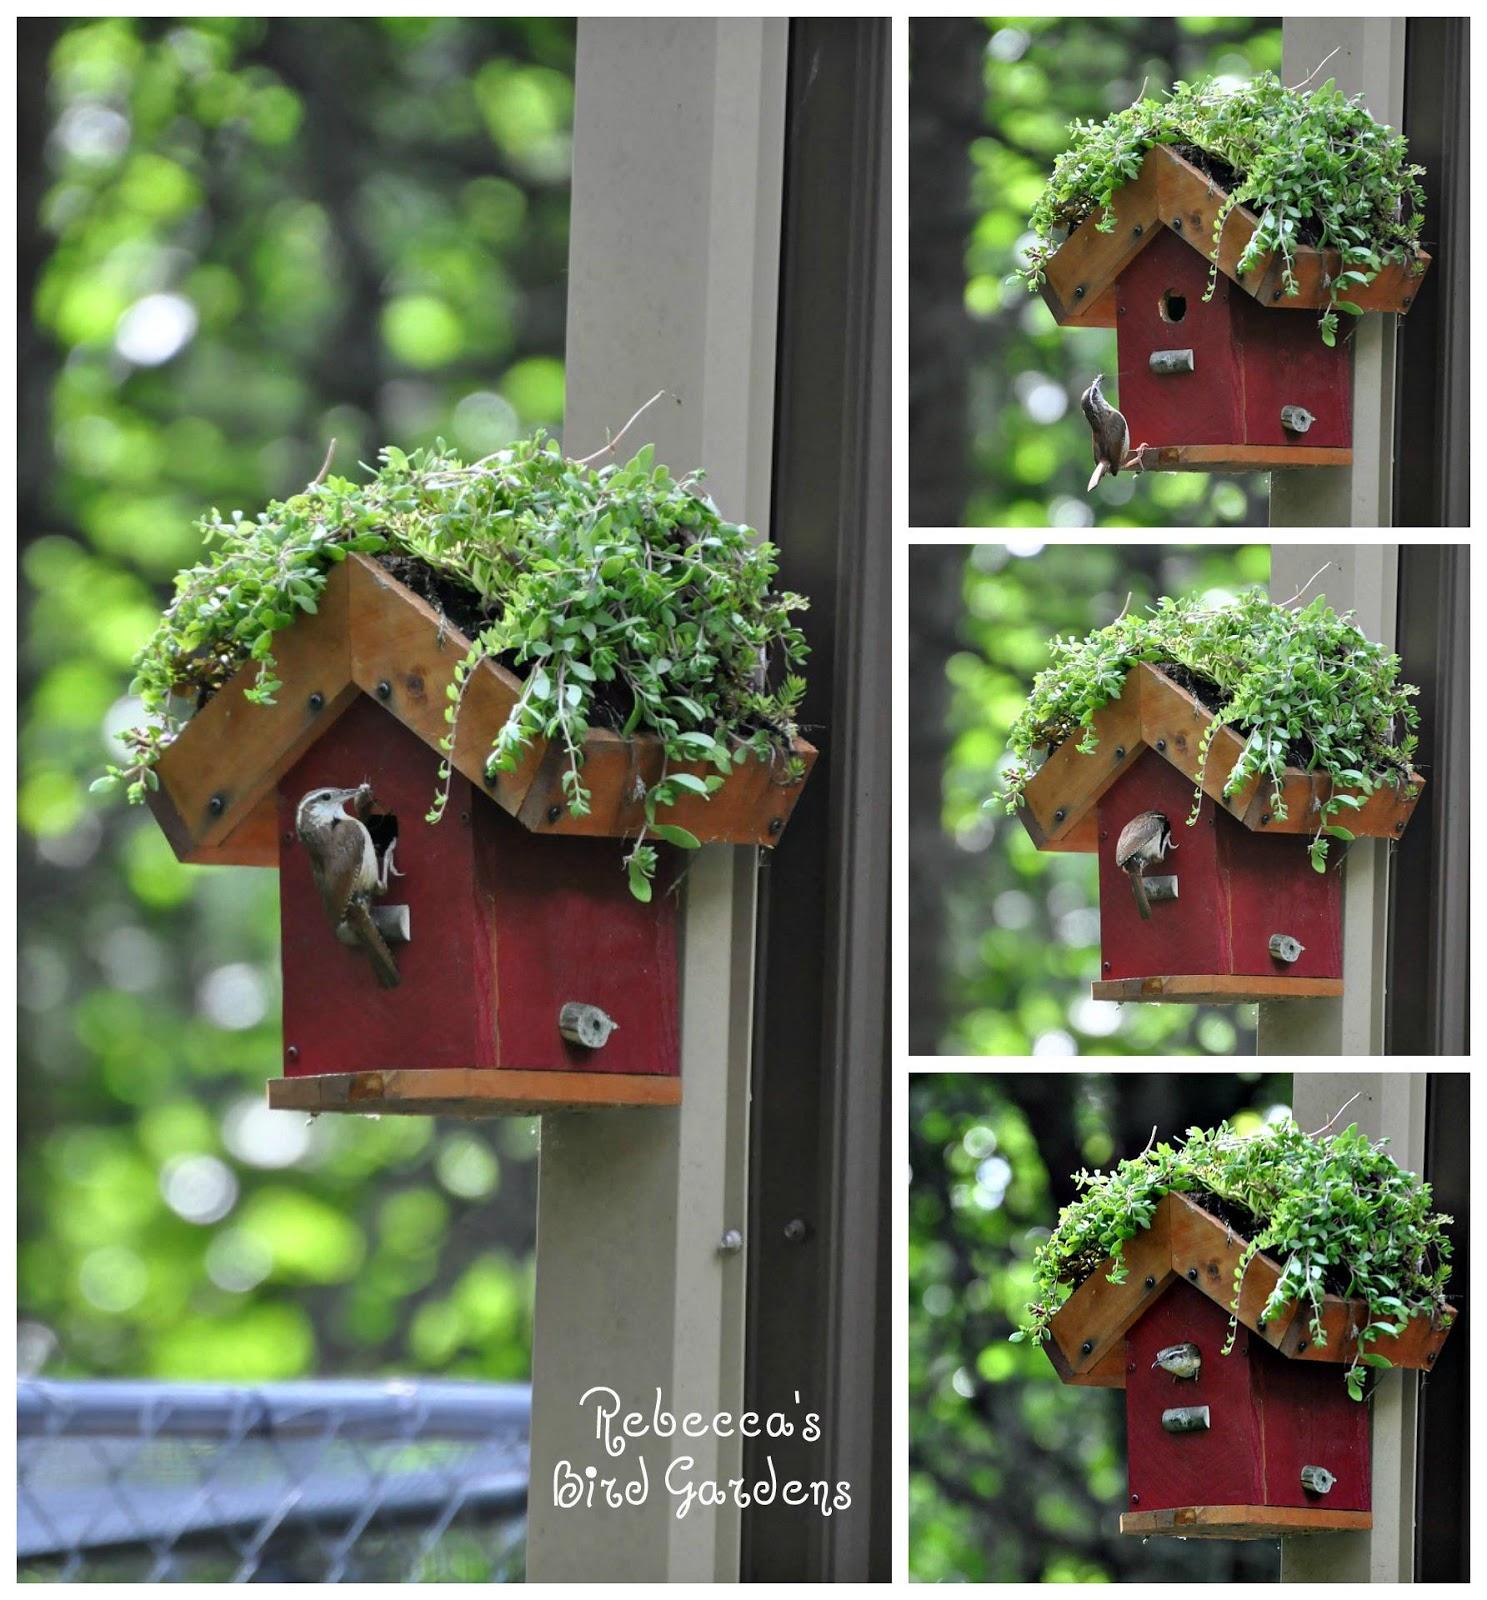 Rebecca S Bird Gardens Blog Diy Living Roof Birdhouse